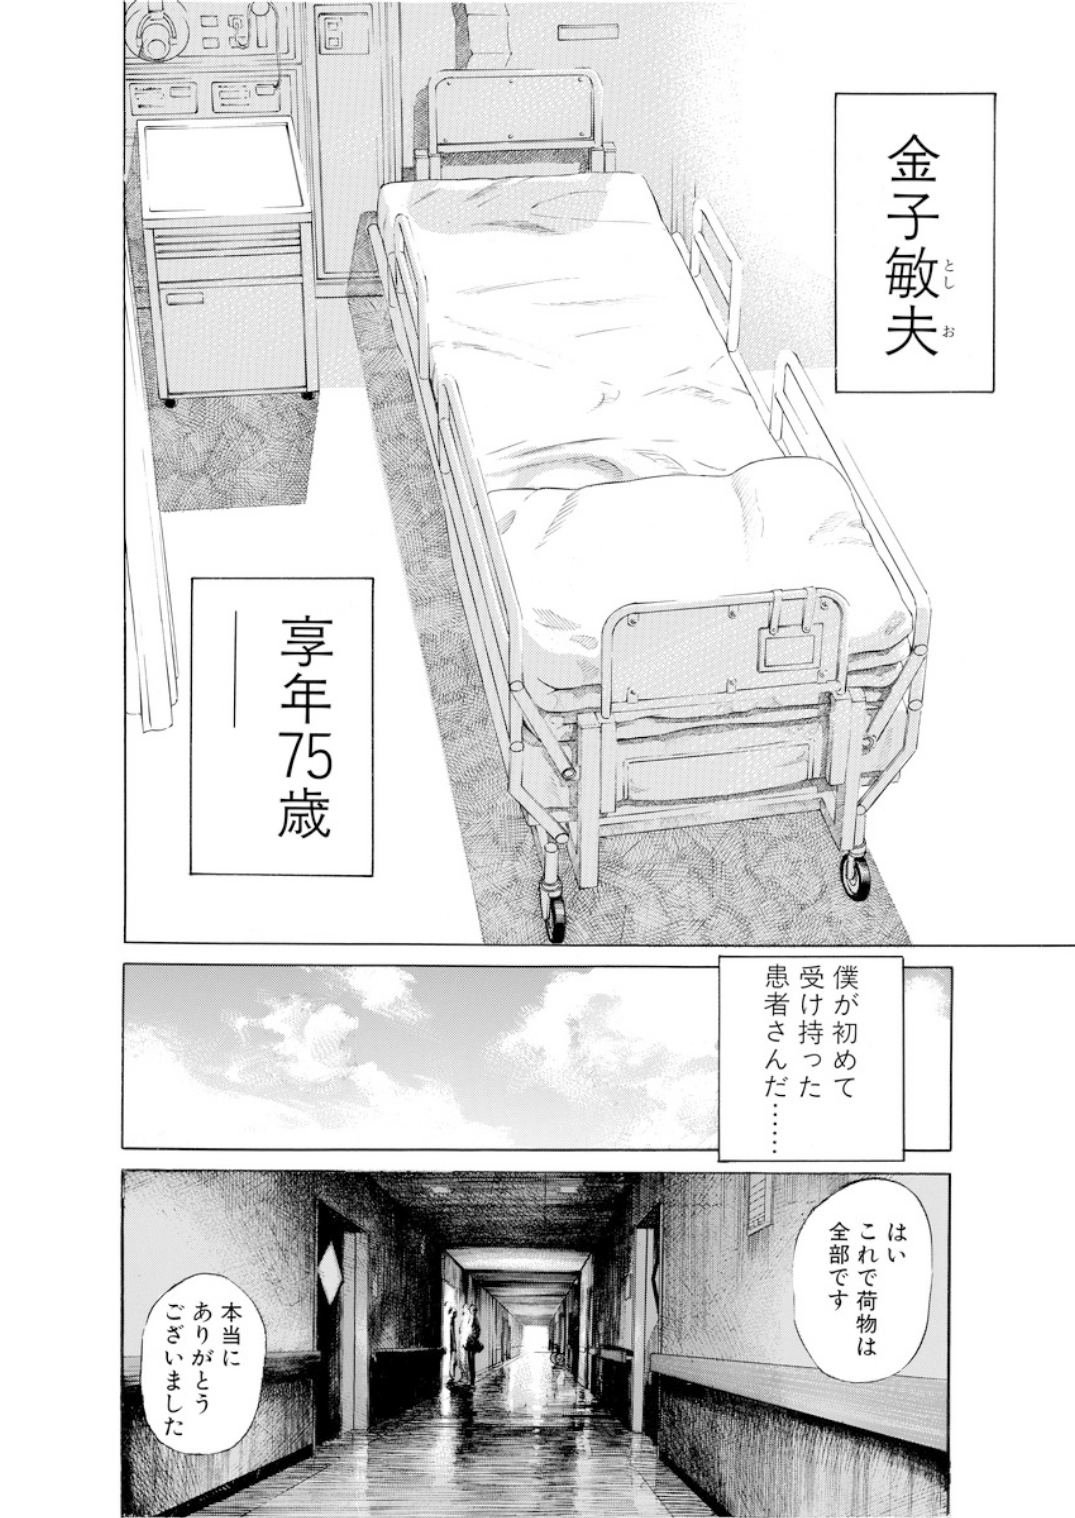 001bj_page-0138.jpg